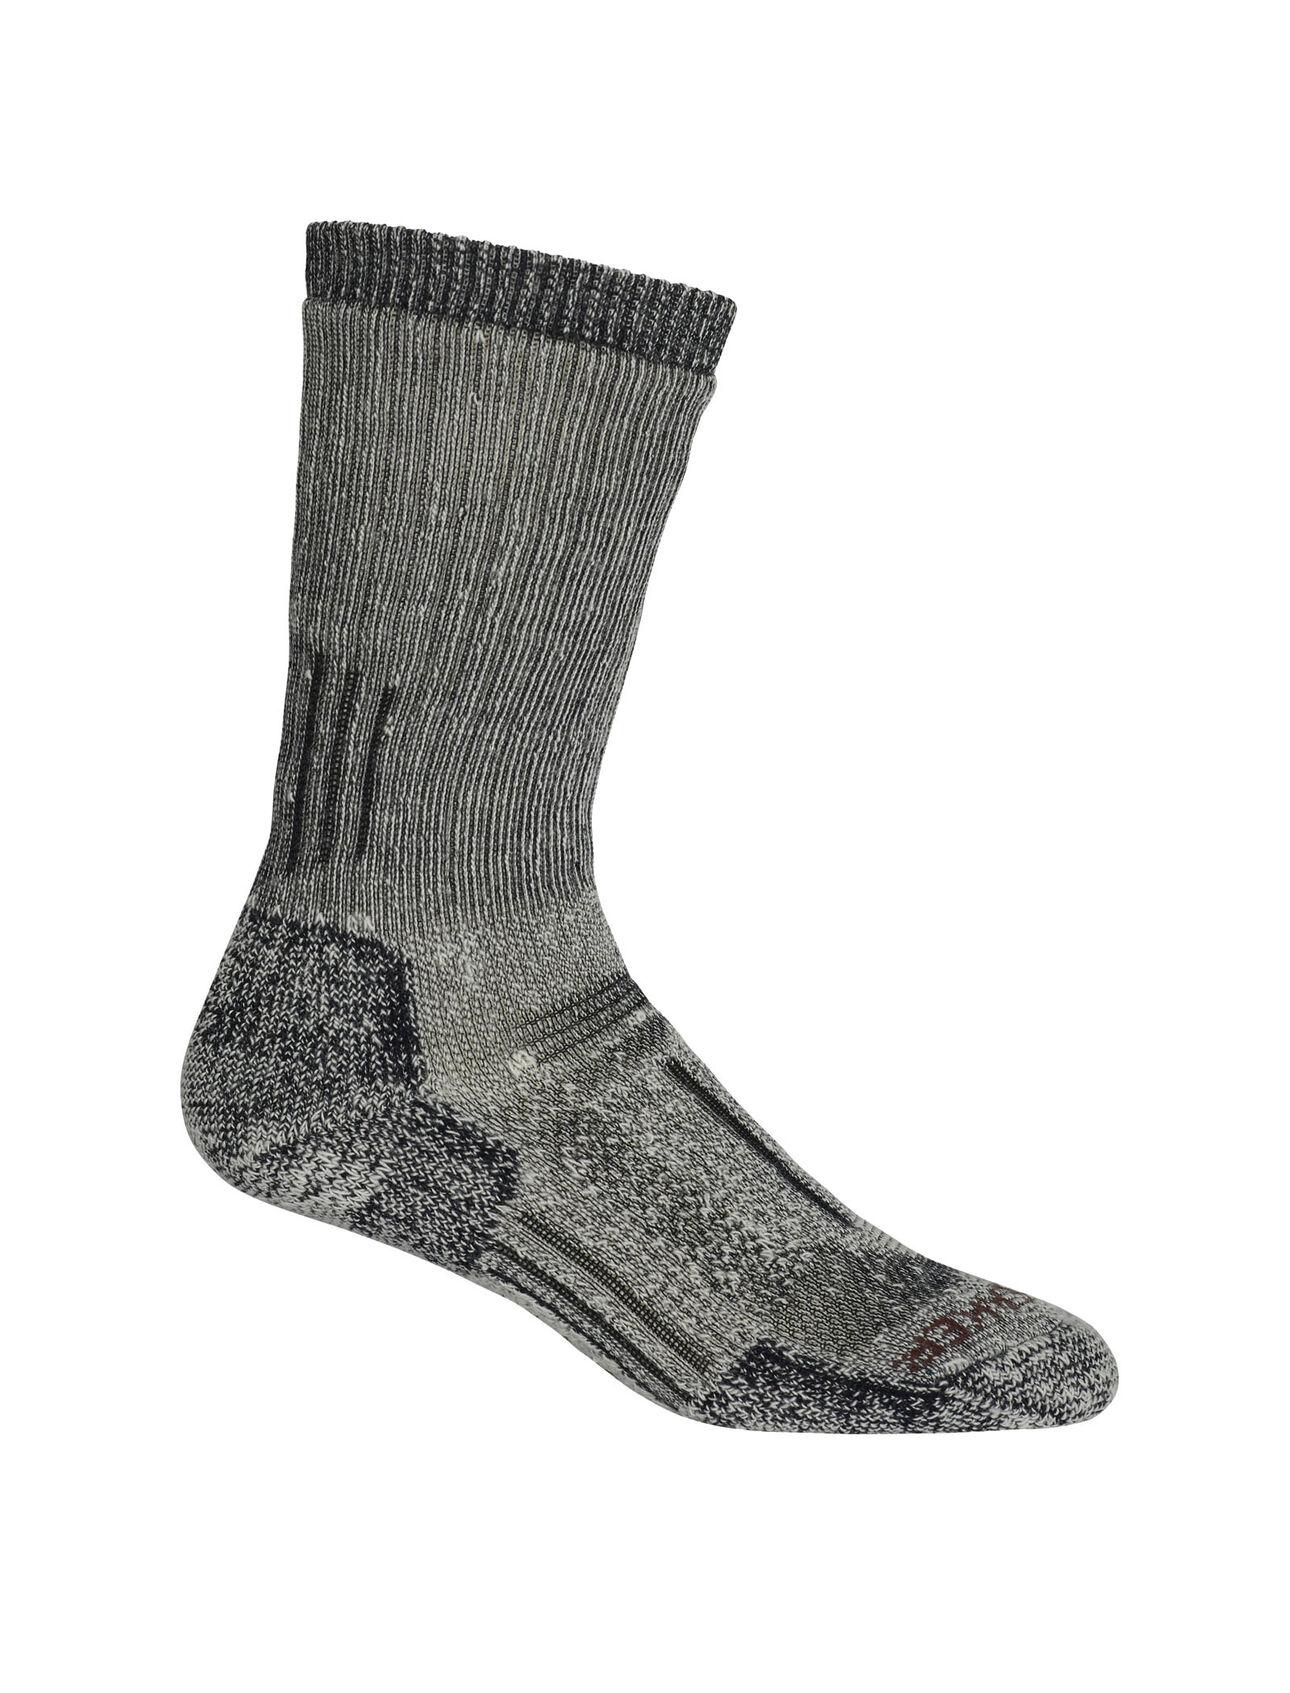 Mountaineer高筒登山袜